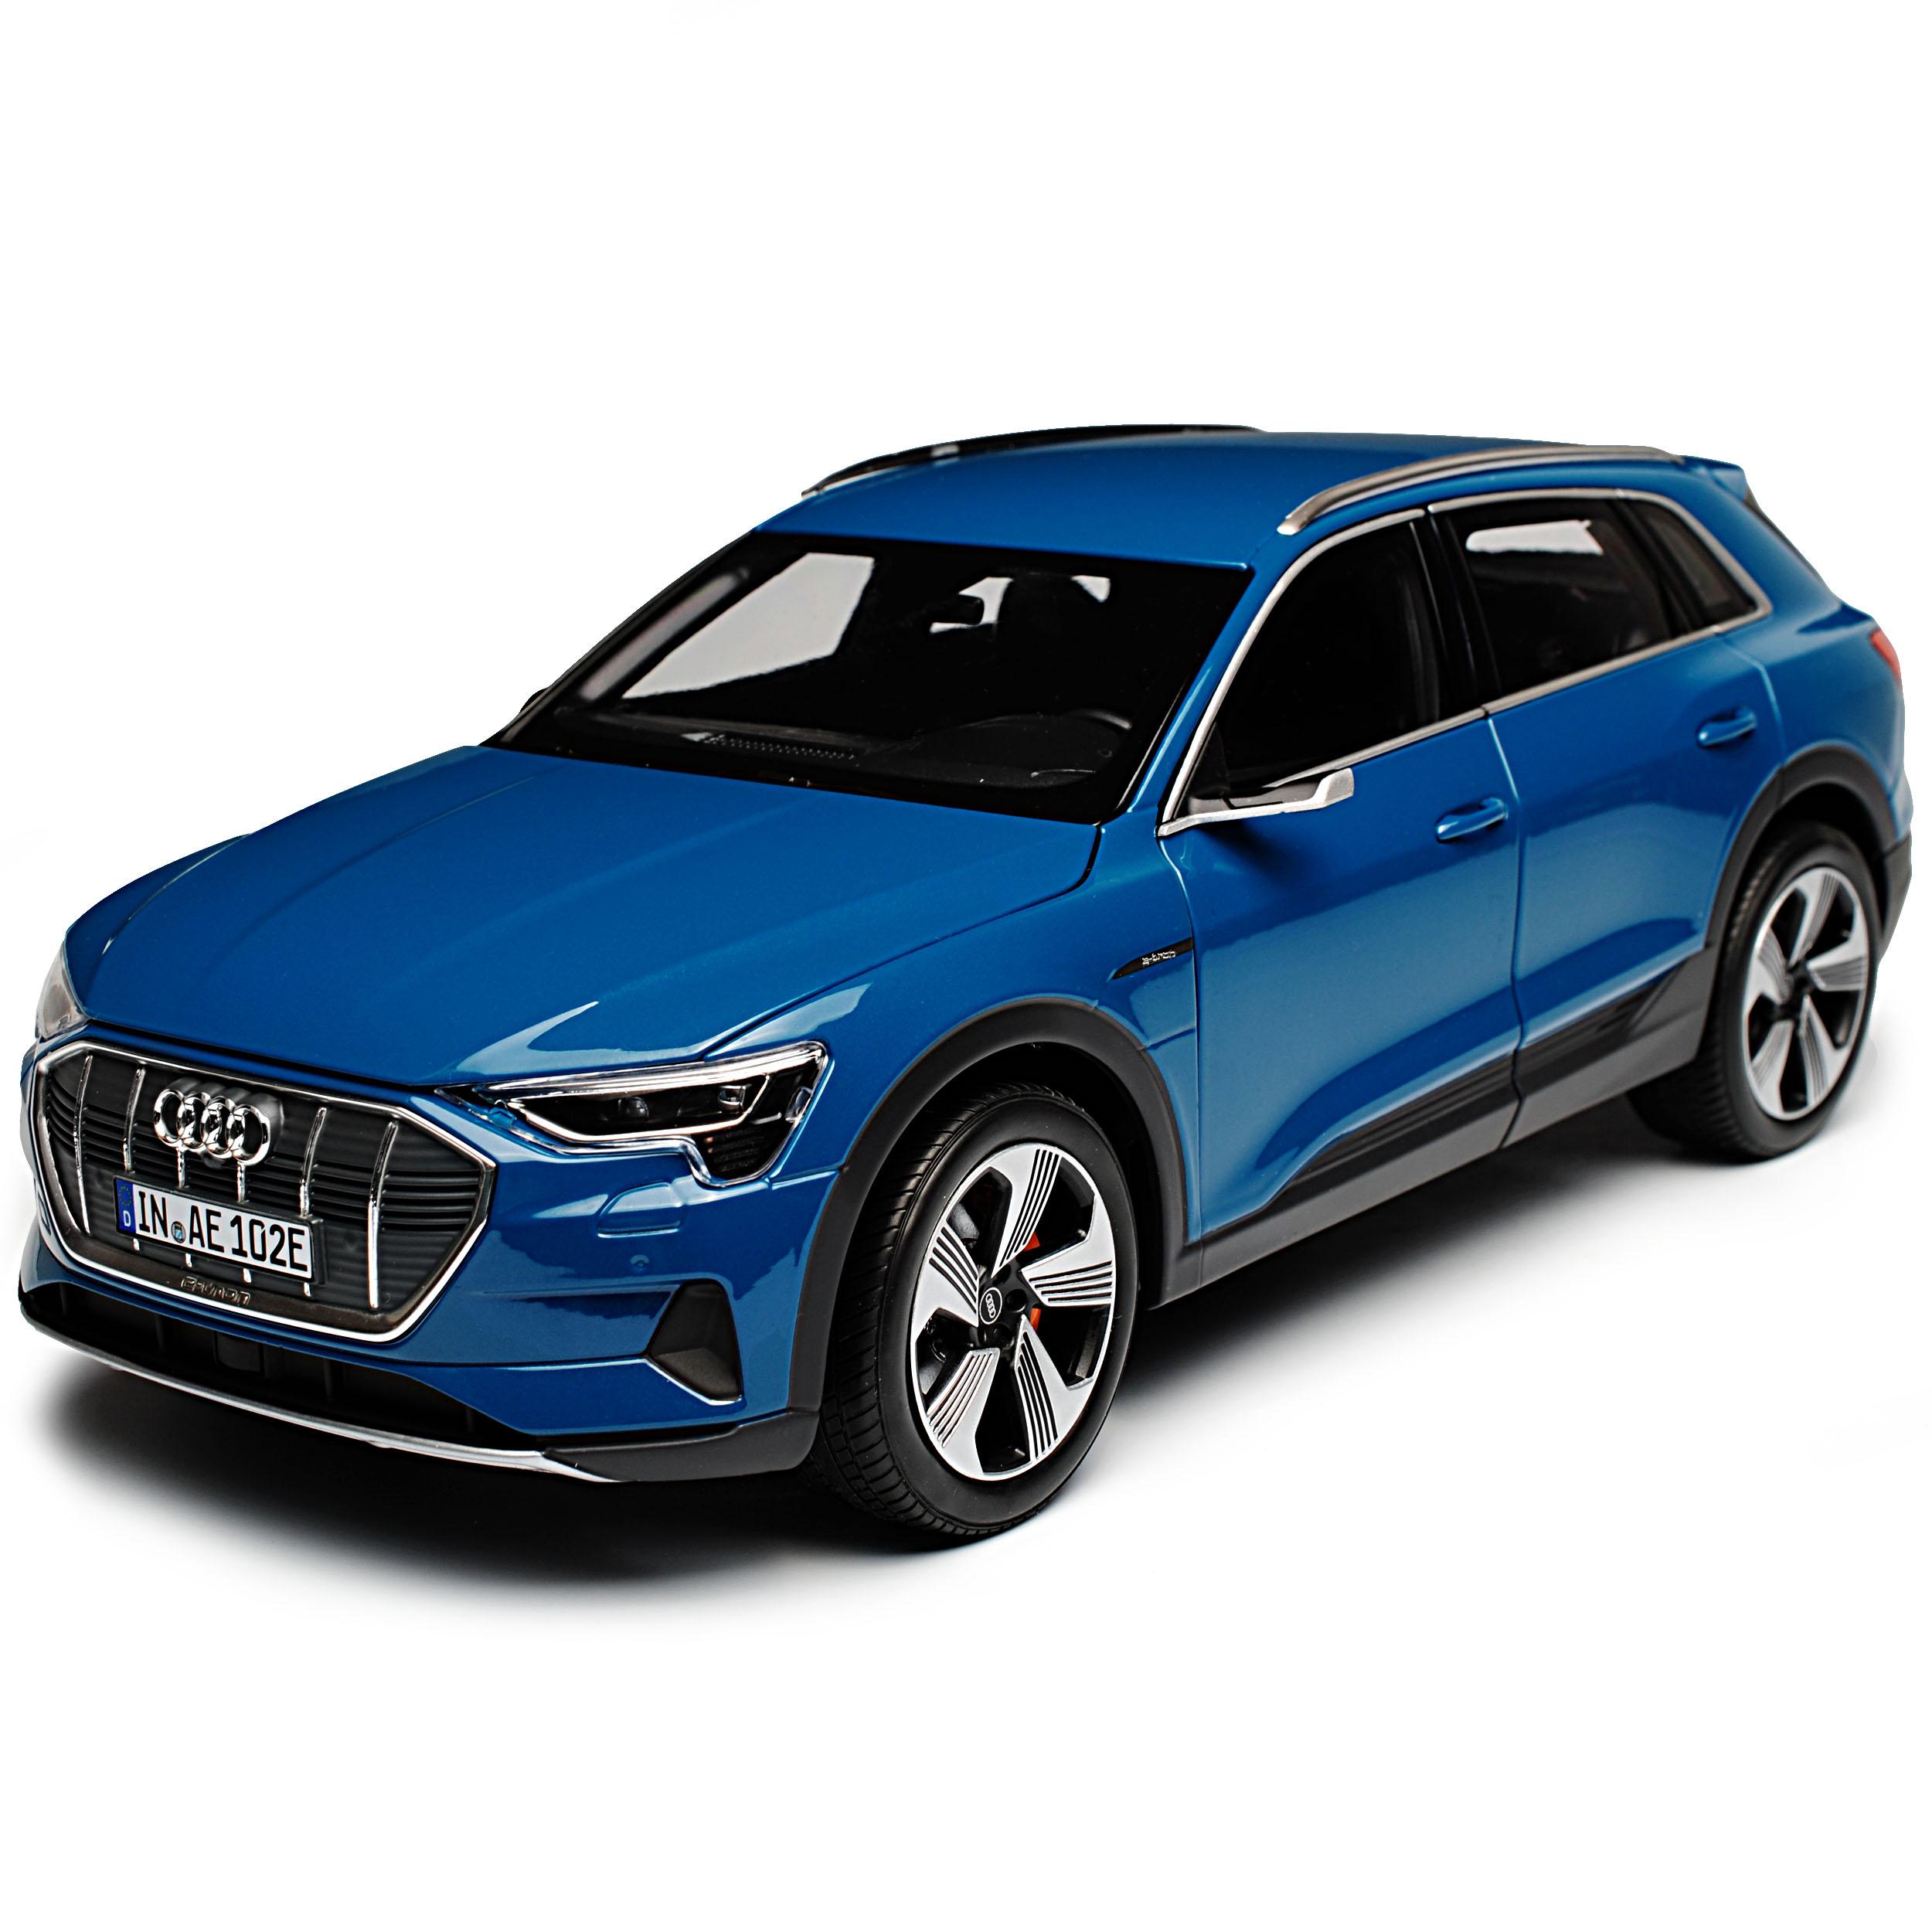 Audi e-tron 1:18 Antiguablau 5011820651 Modellauto Miniatur Norev Blau